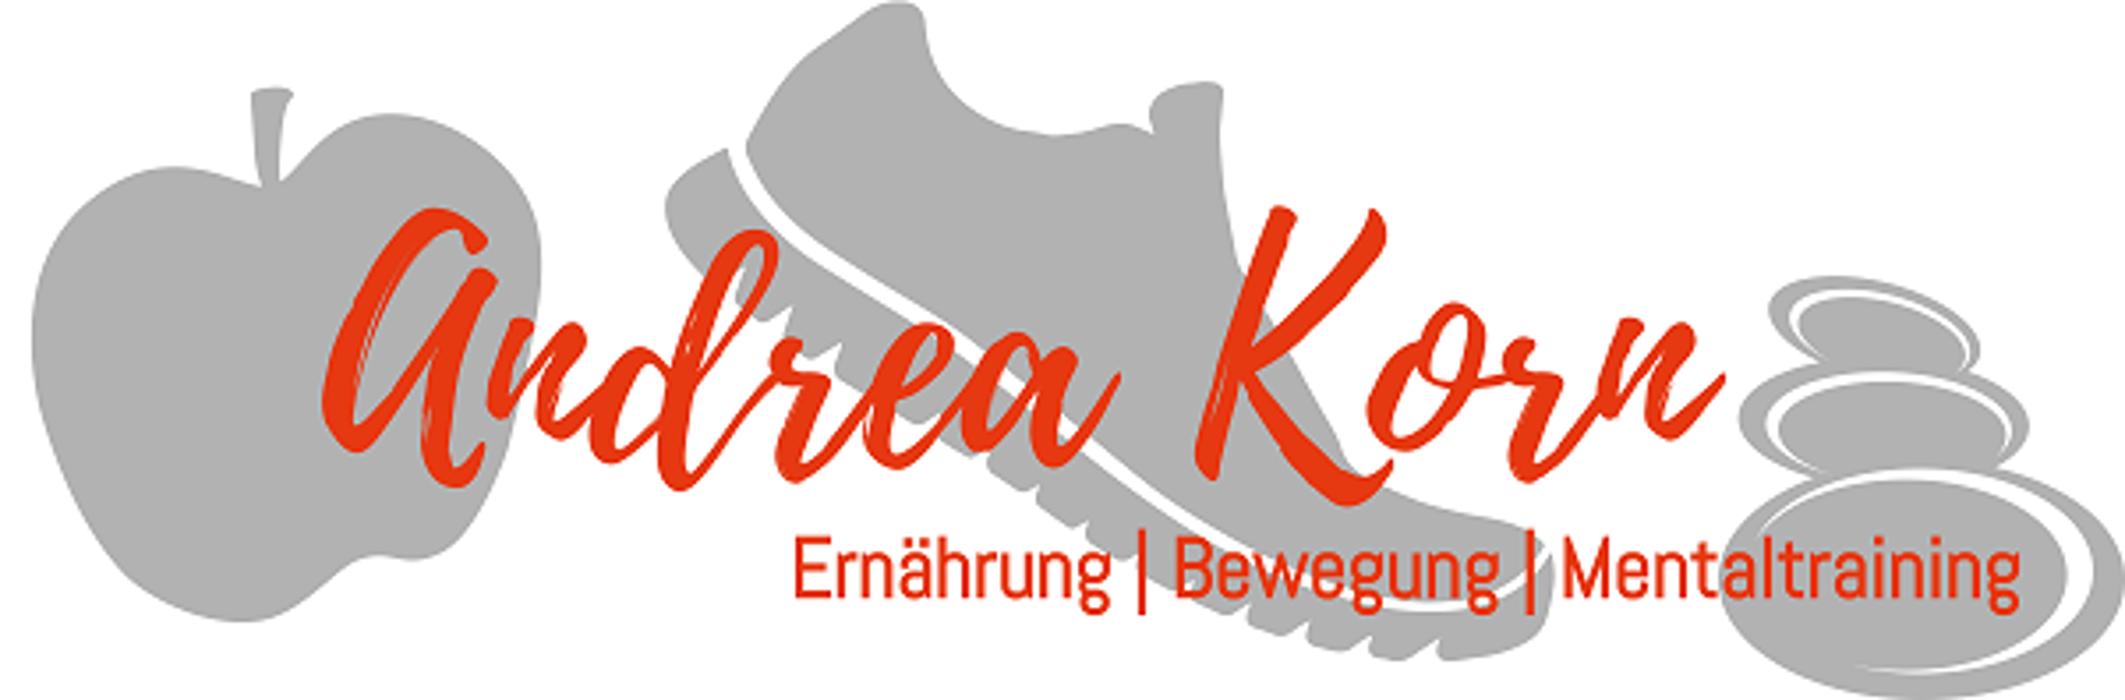 Bild zu Andrea Korn - Ernährungsberatung in Zirndorf